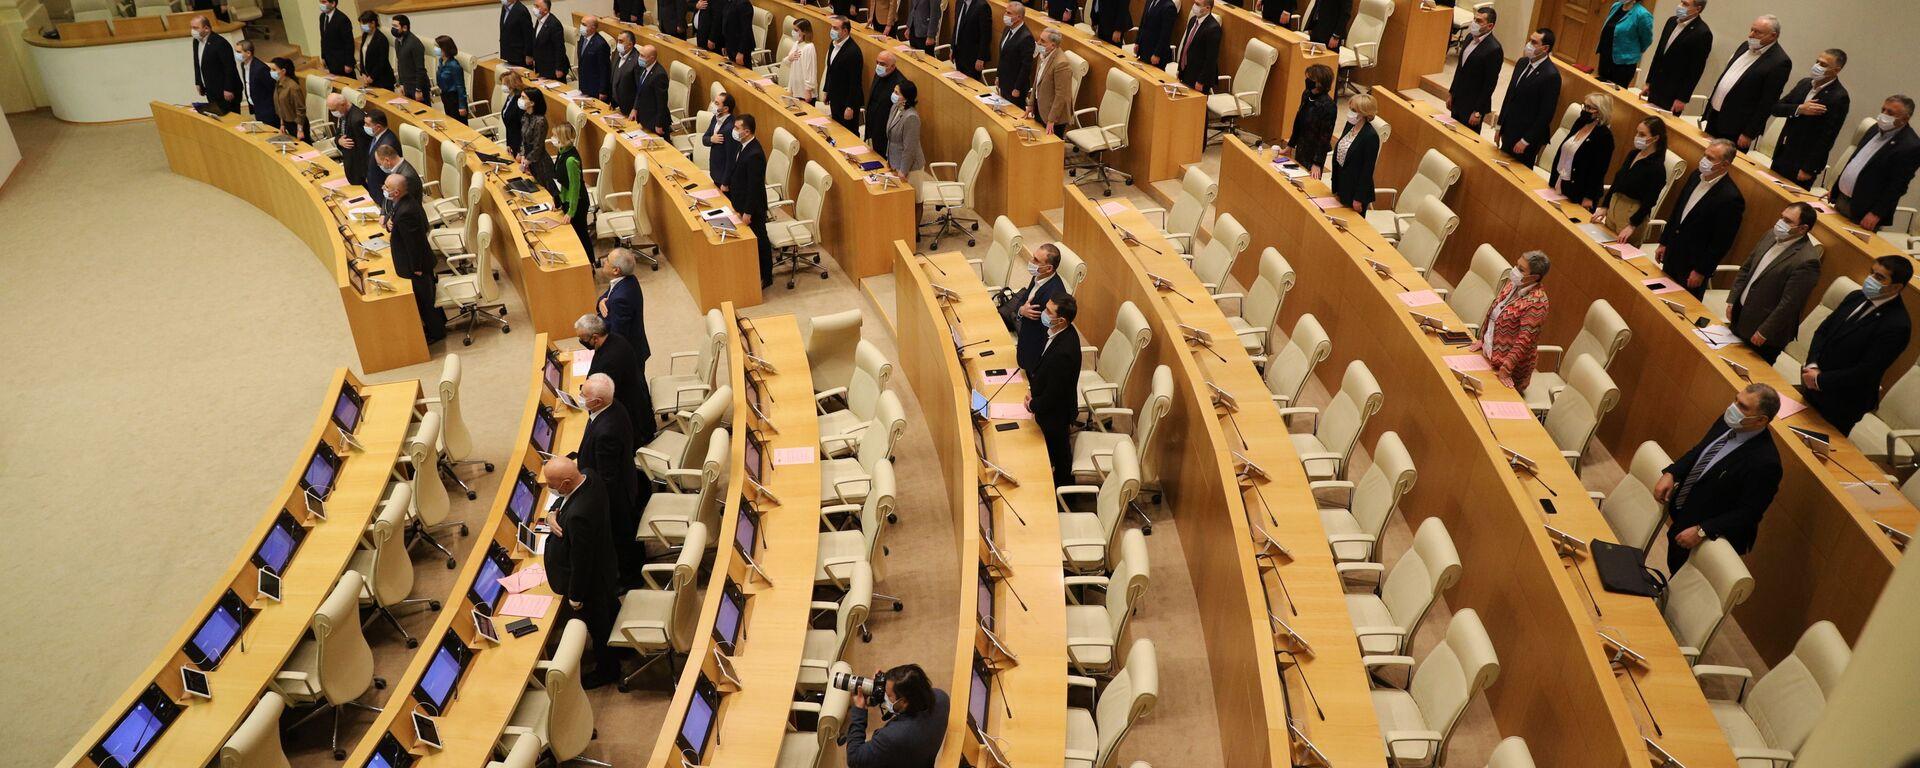 Парламент Грузии - начало заседания - Sputnik Грузия, 1920, 25.05.2021